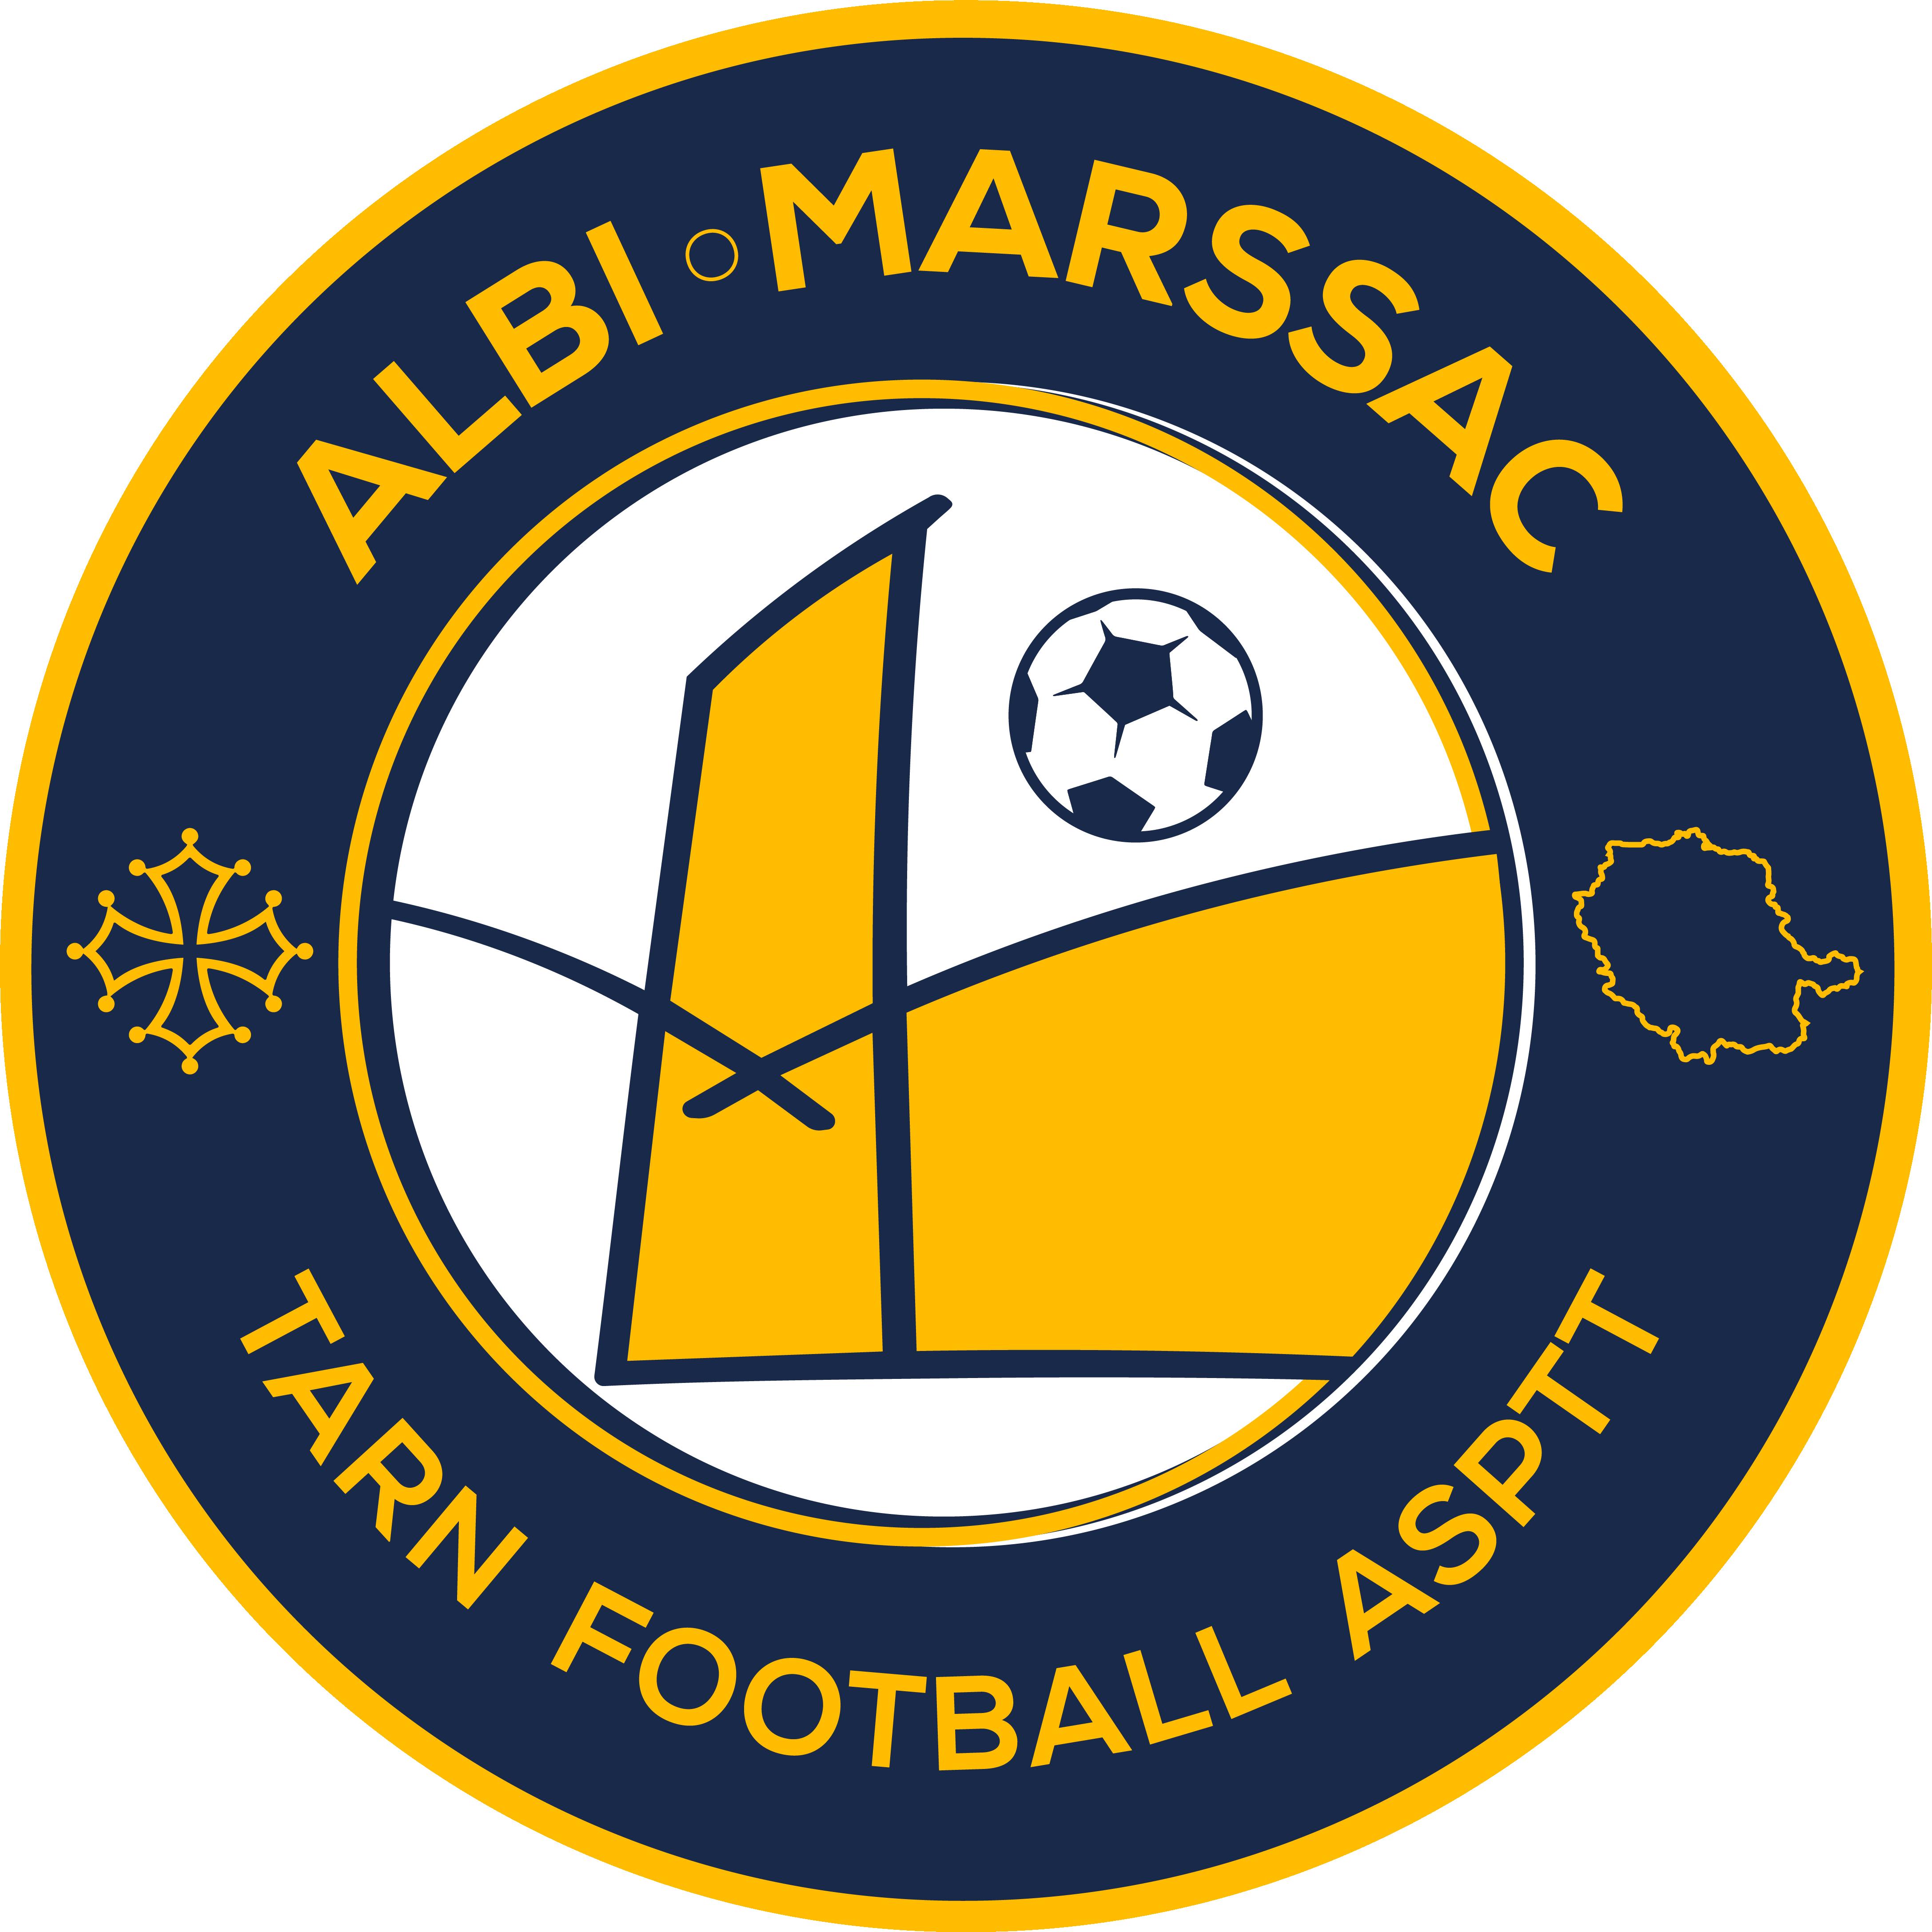 ASPTT Football de l'Albigeois - AMTF